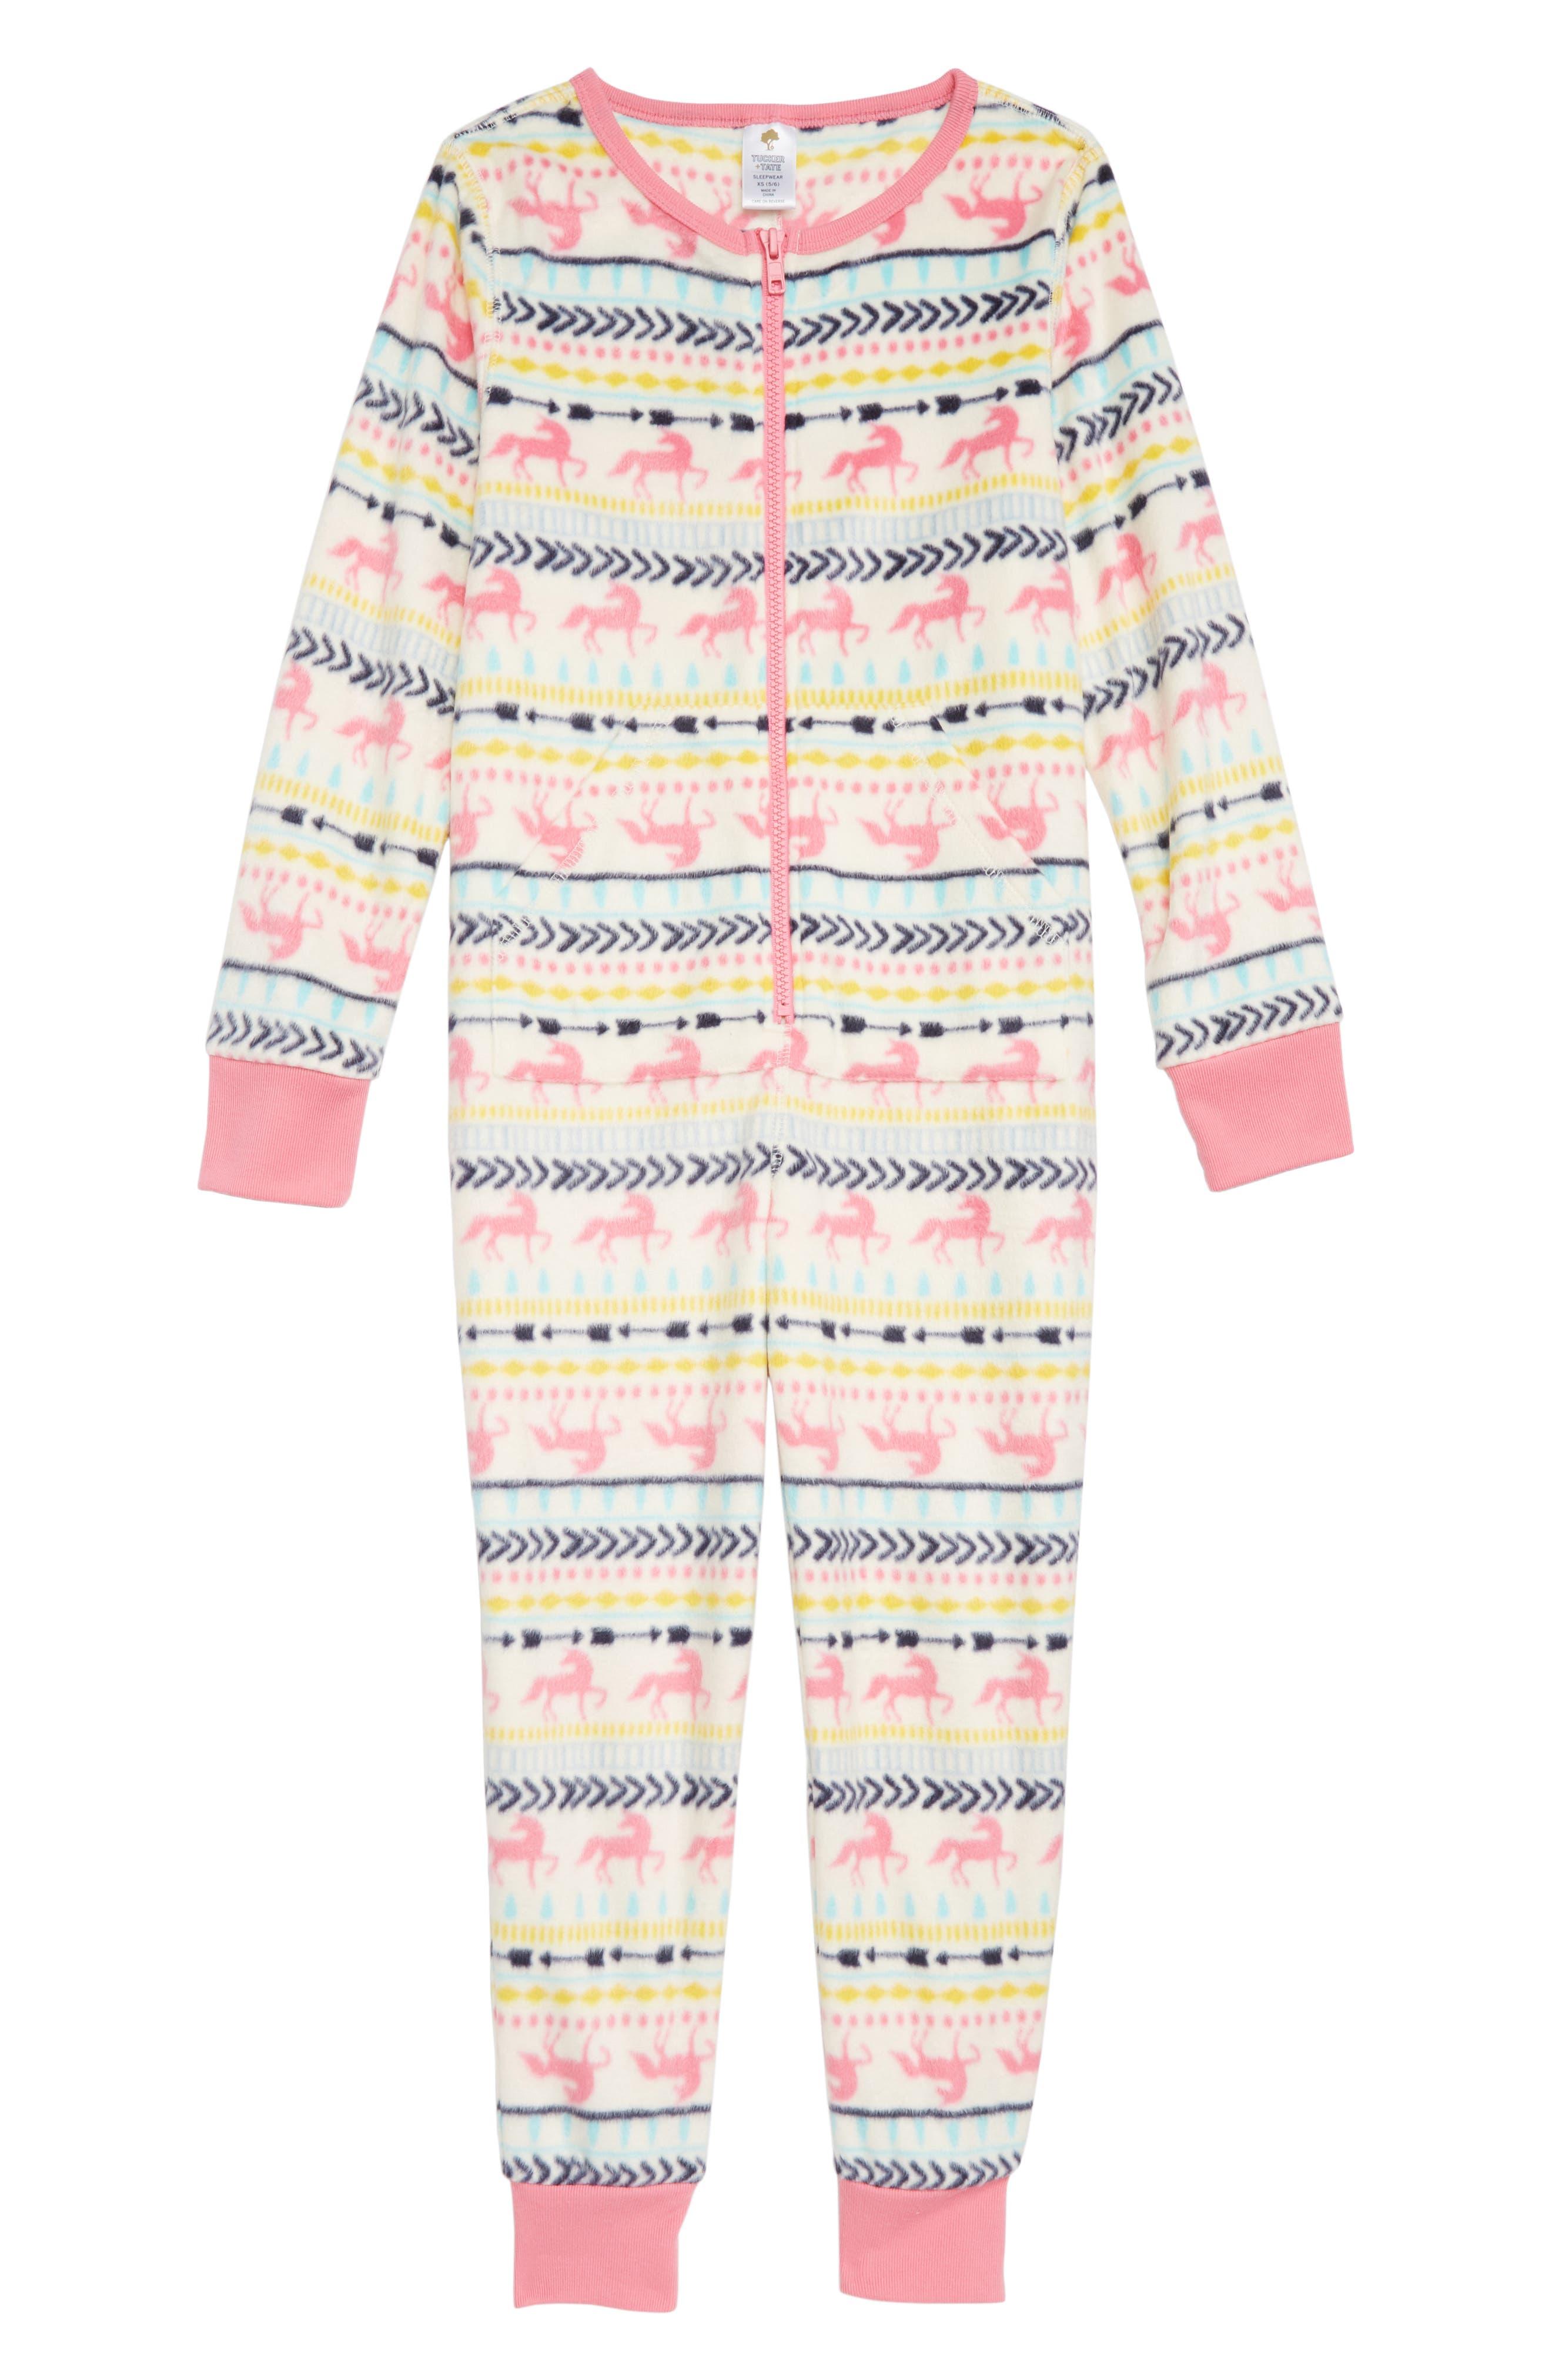 Cozy Print Fitted One-Piece Pajamas,                             Main thumbnail 1, color,                             IVORY EGRET UNICORN FAIRISLE